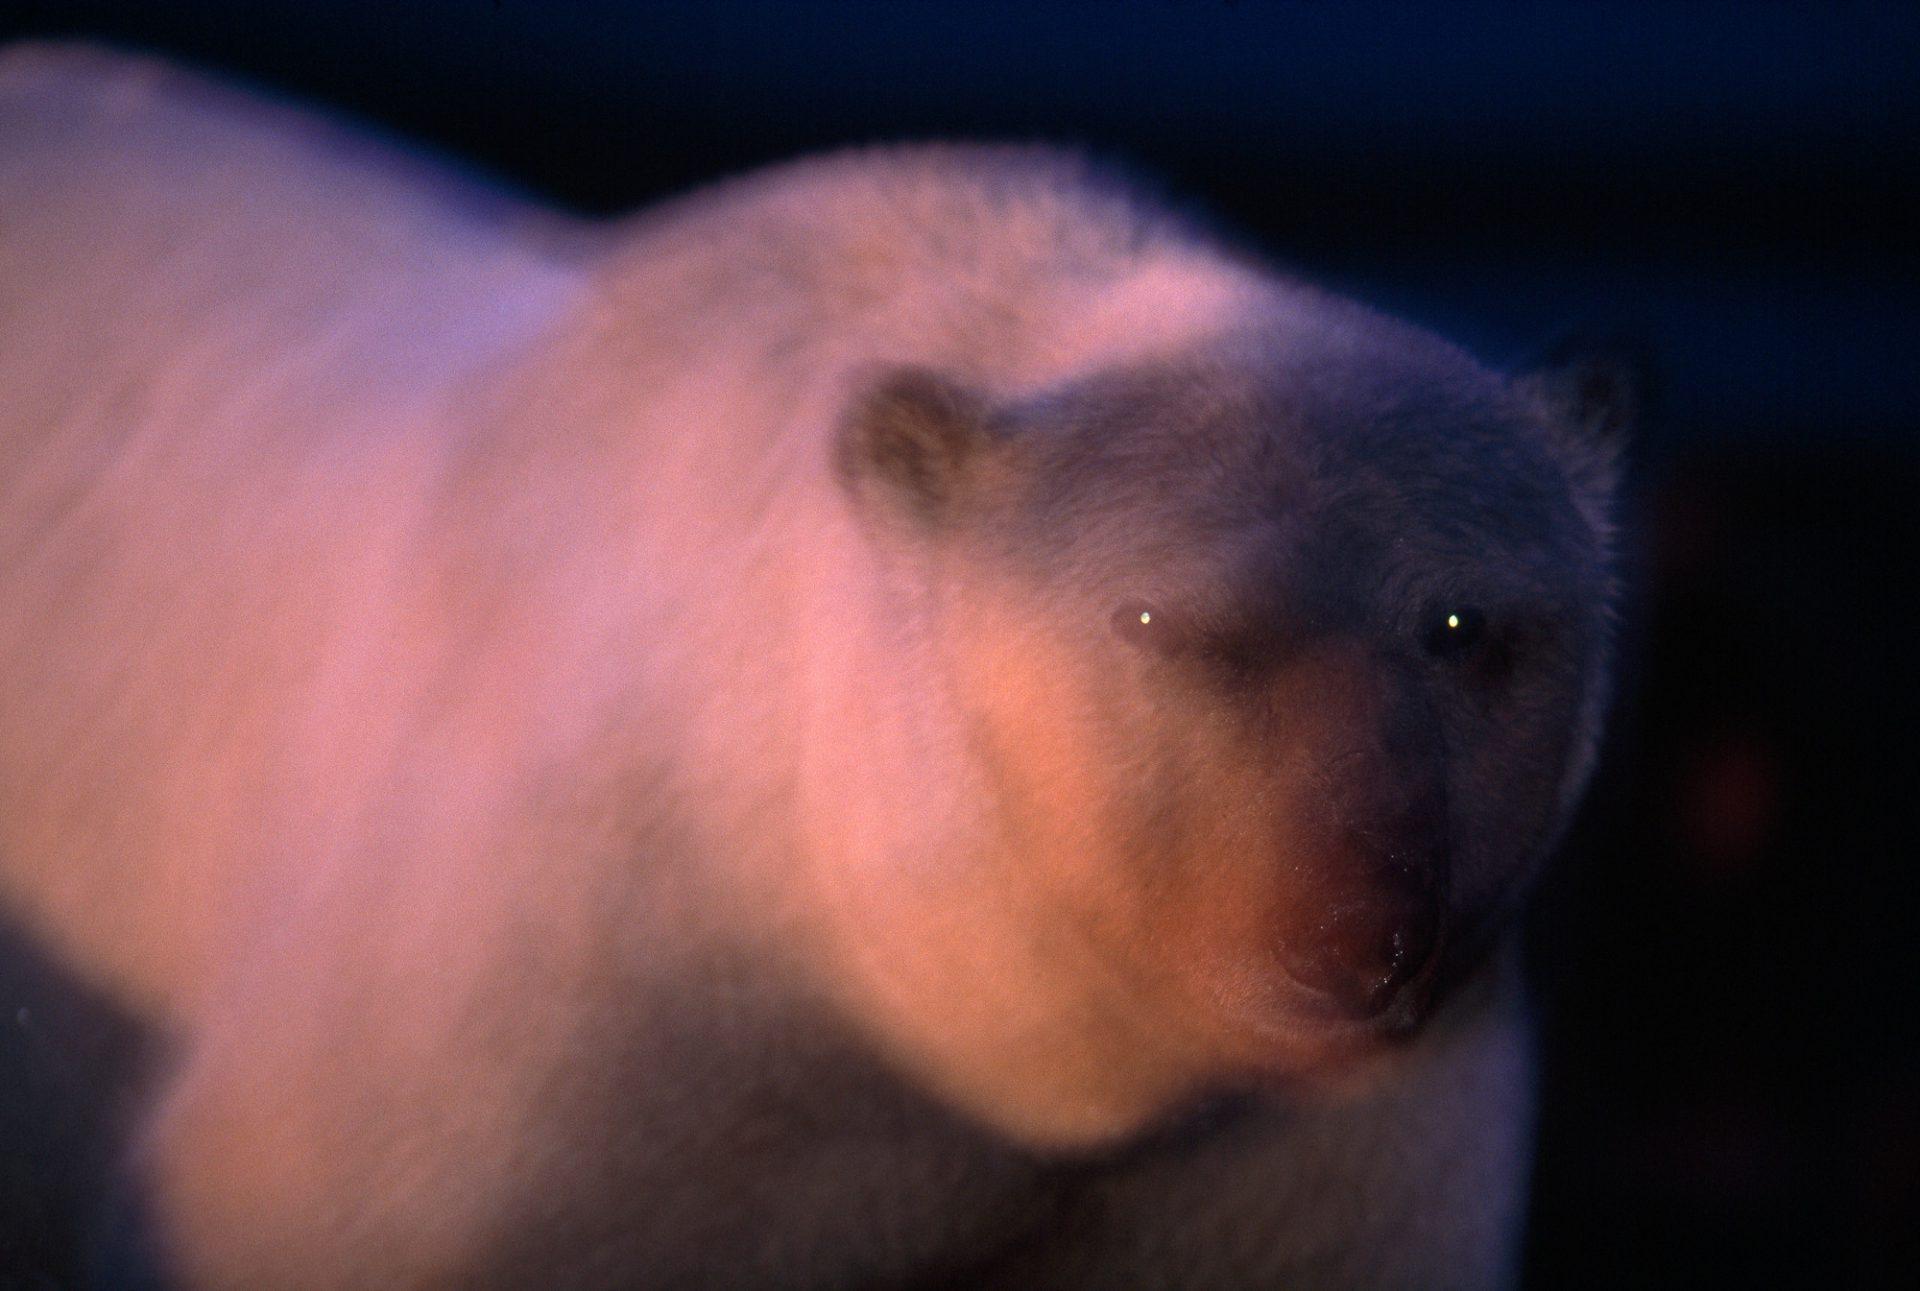 A polar bear (Ursus maritimus) moving about at twilight. (IUCN: Vulnerable, US: Threatened)